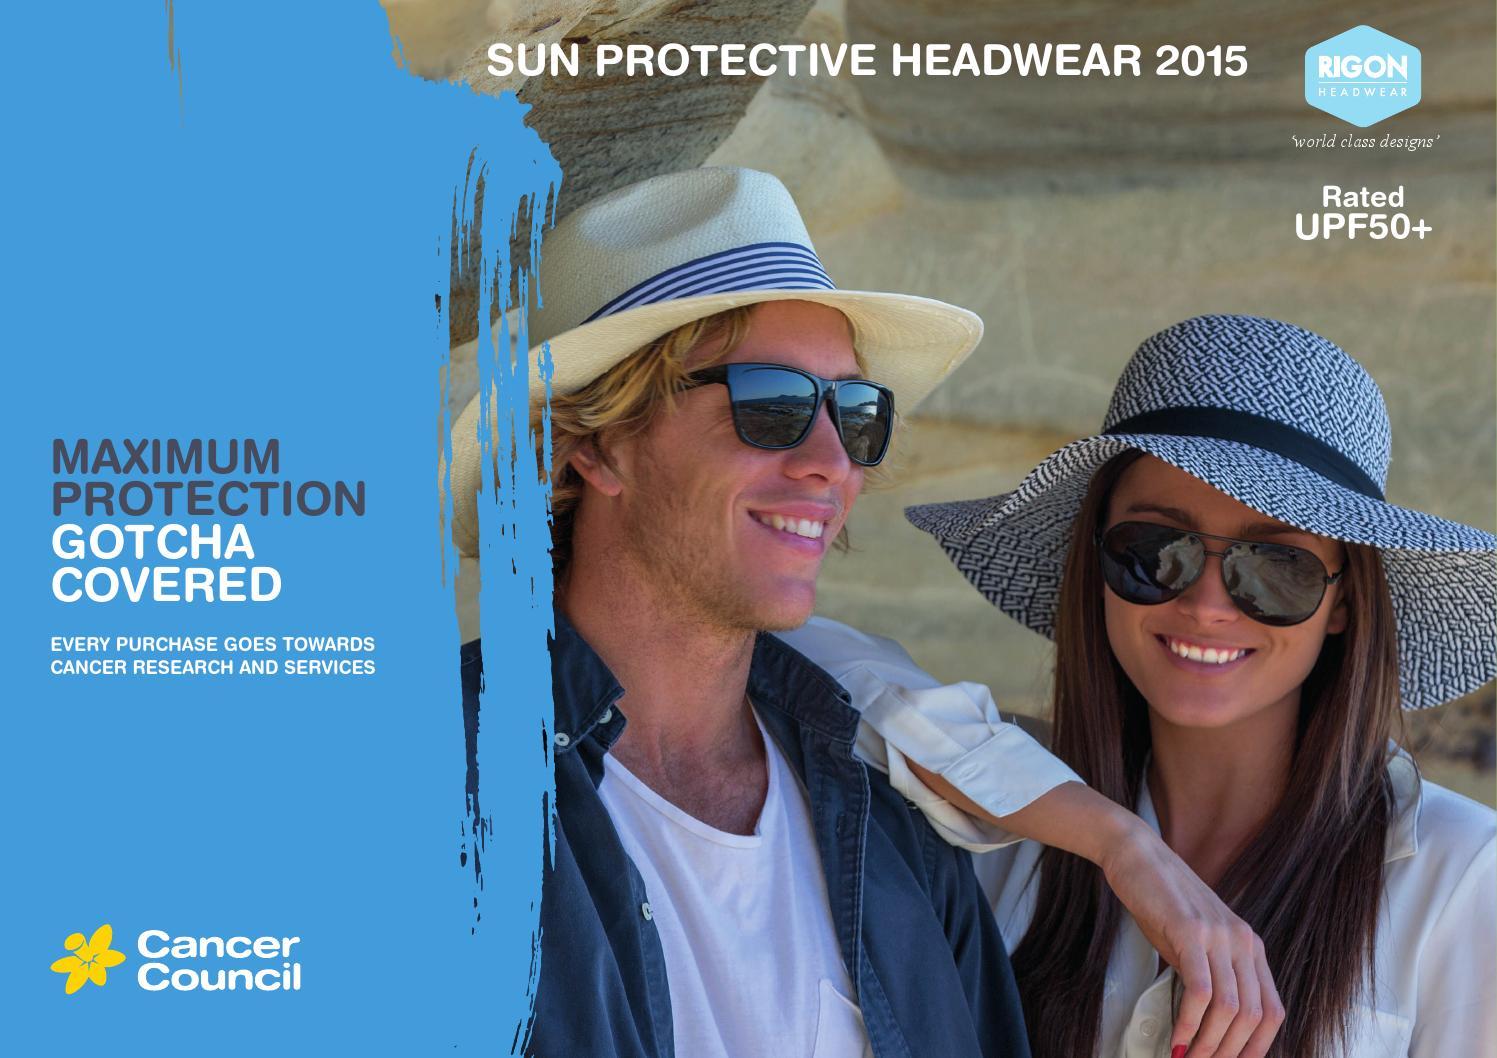 9b8ccb74 Sun Protective Headwear 2015 by Cancer Council Australia by Rigon Headwear  - issuu